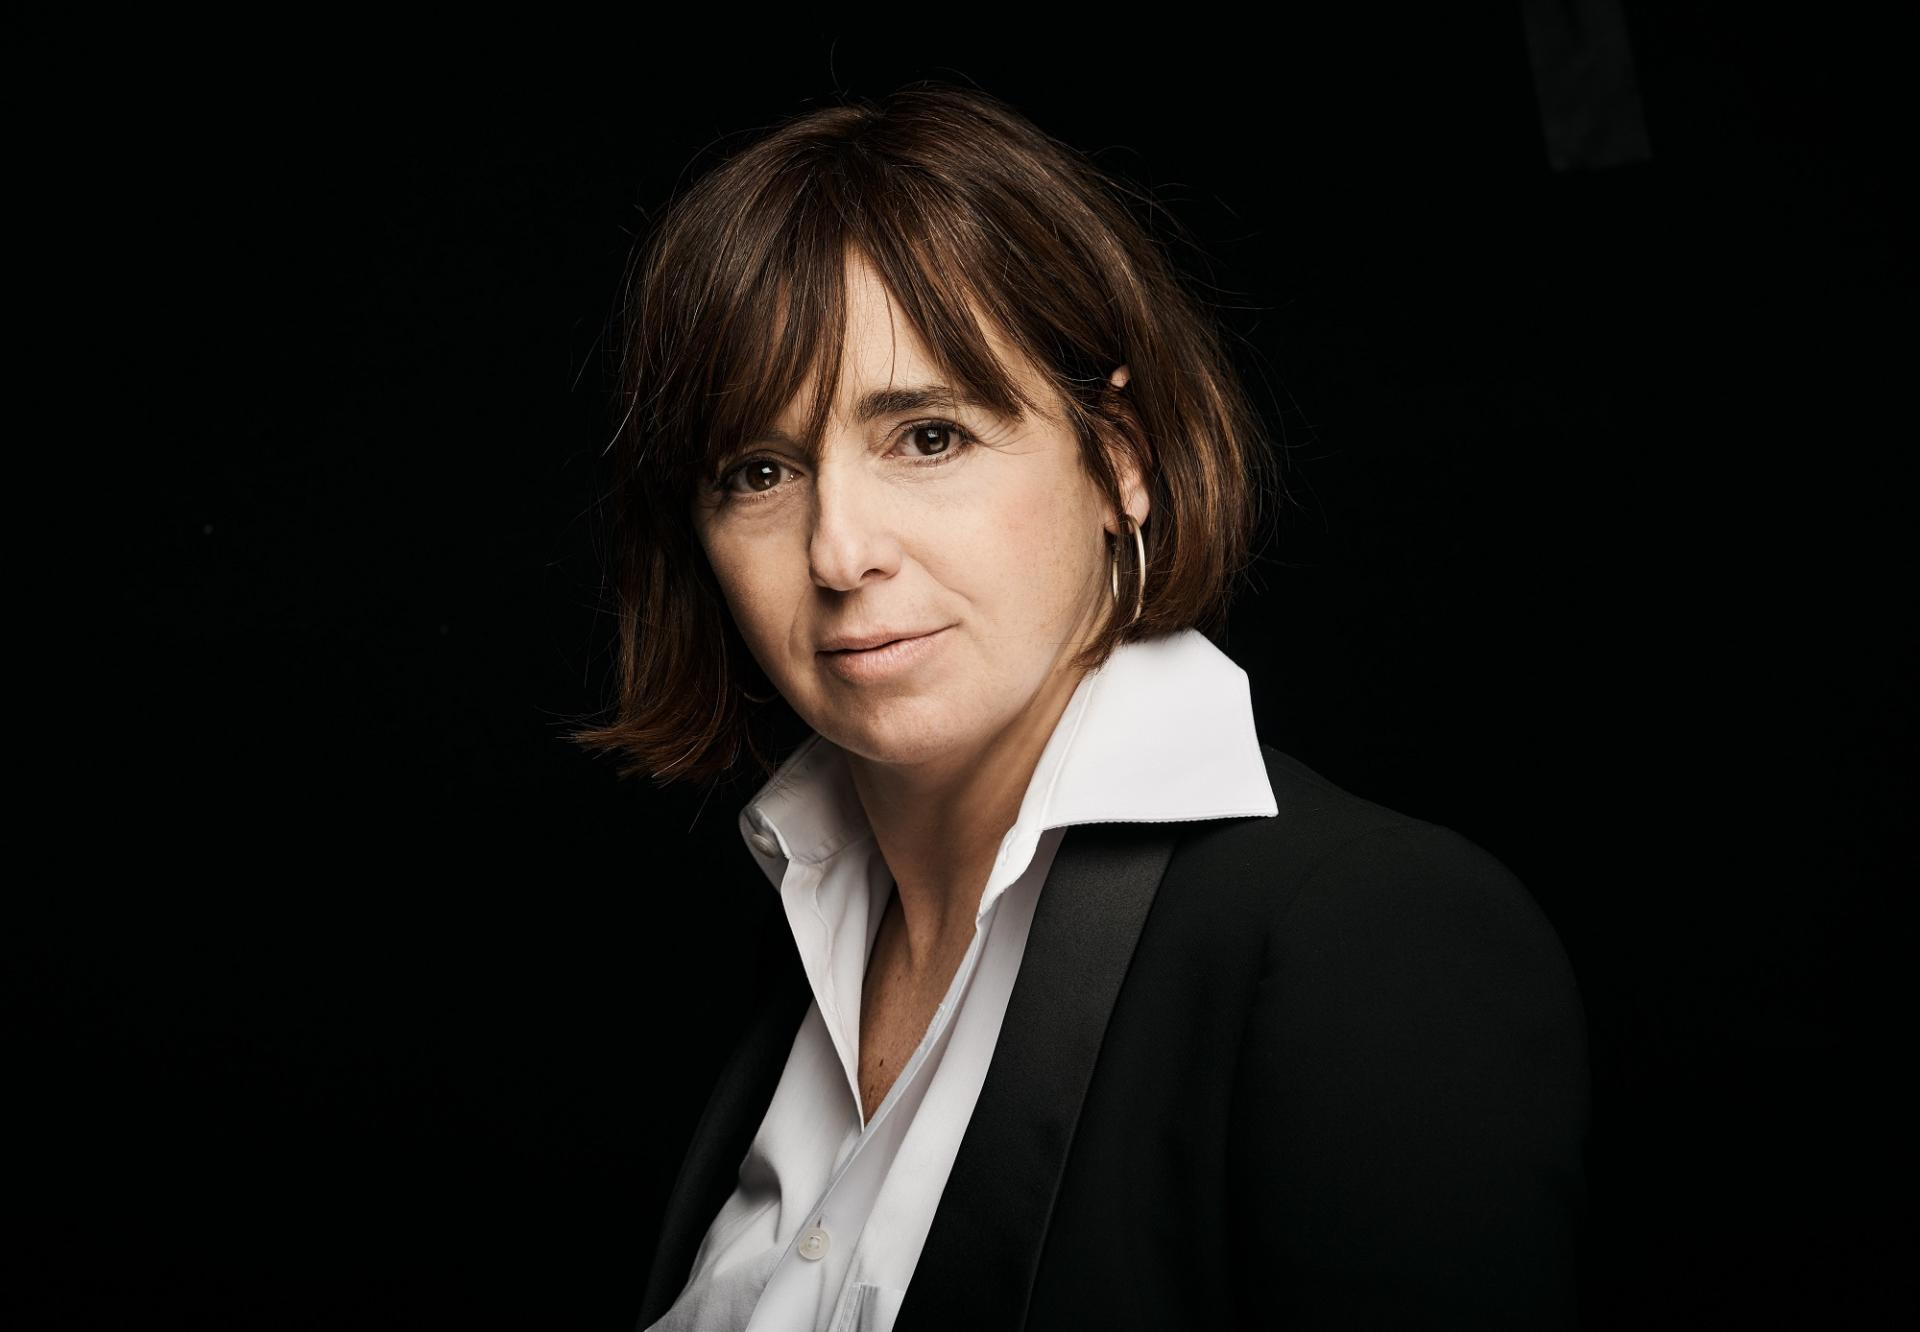 La directora i dramaturga Carol López. Foto: David Ruano